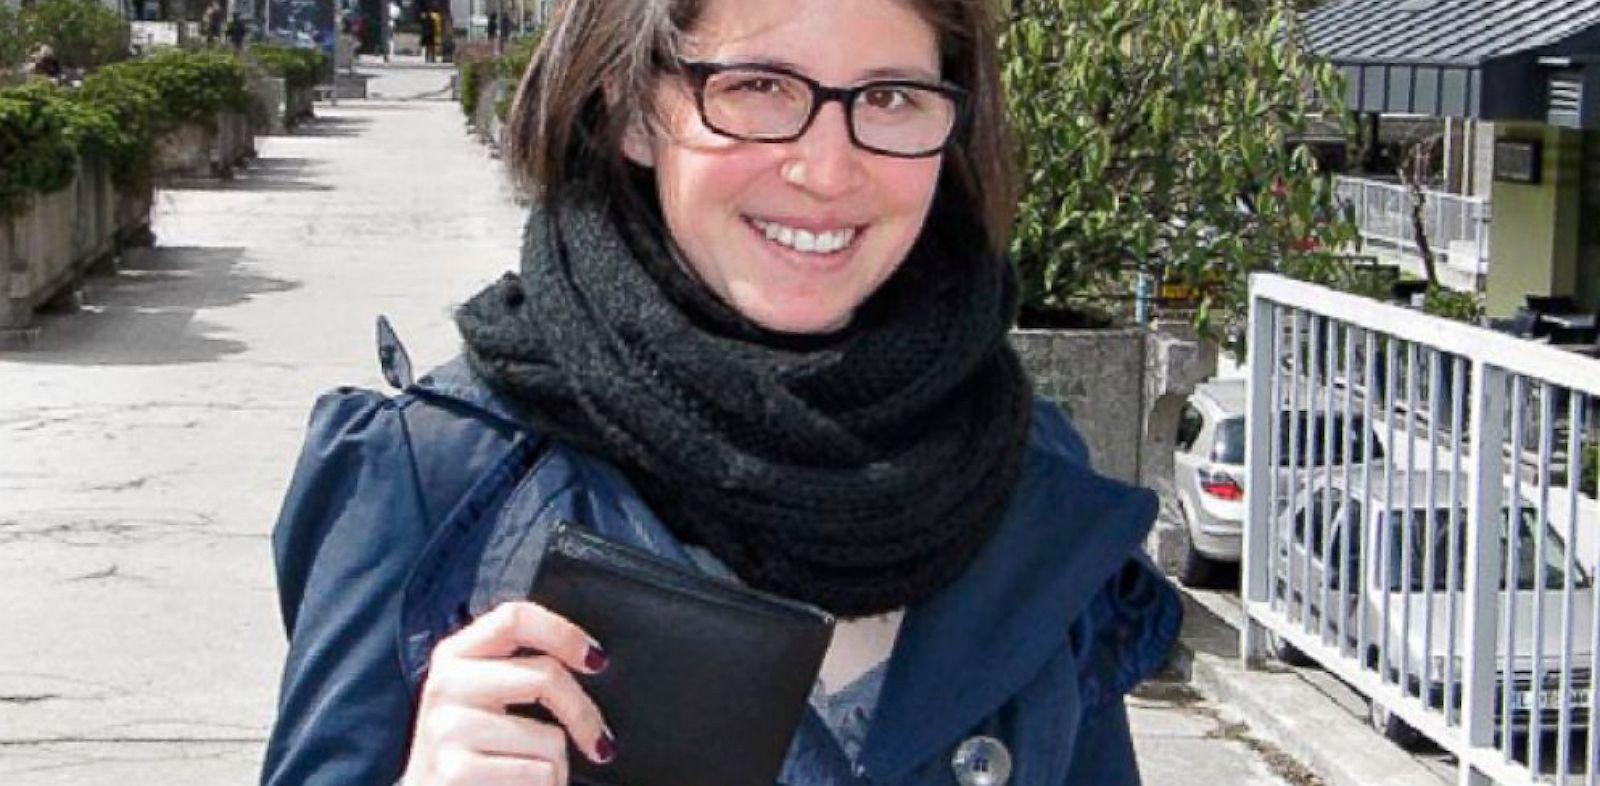 PHOTO: Manca Smolej holding dropped wallet